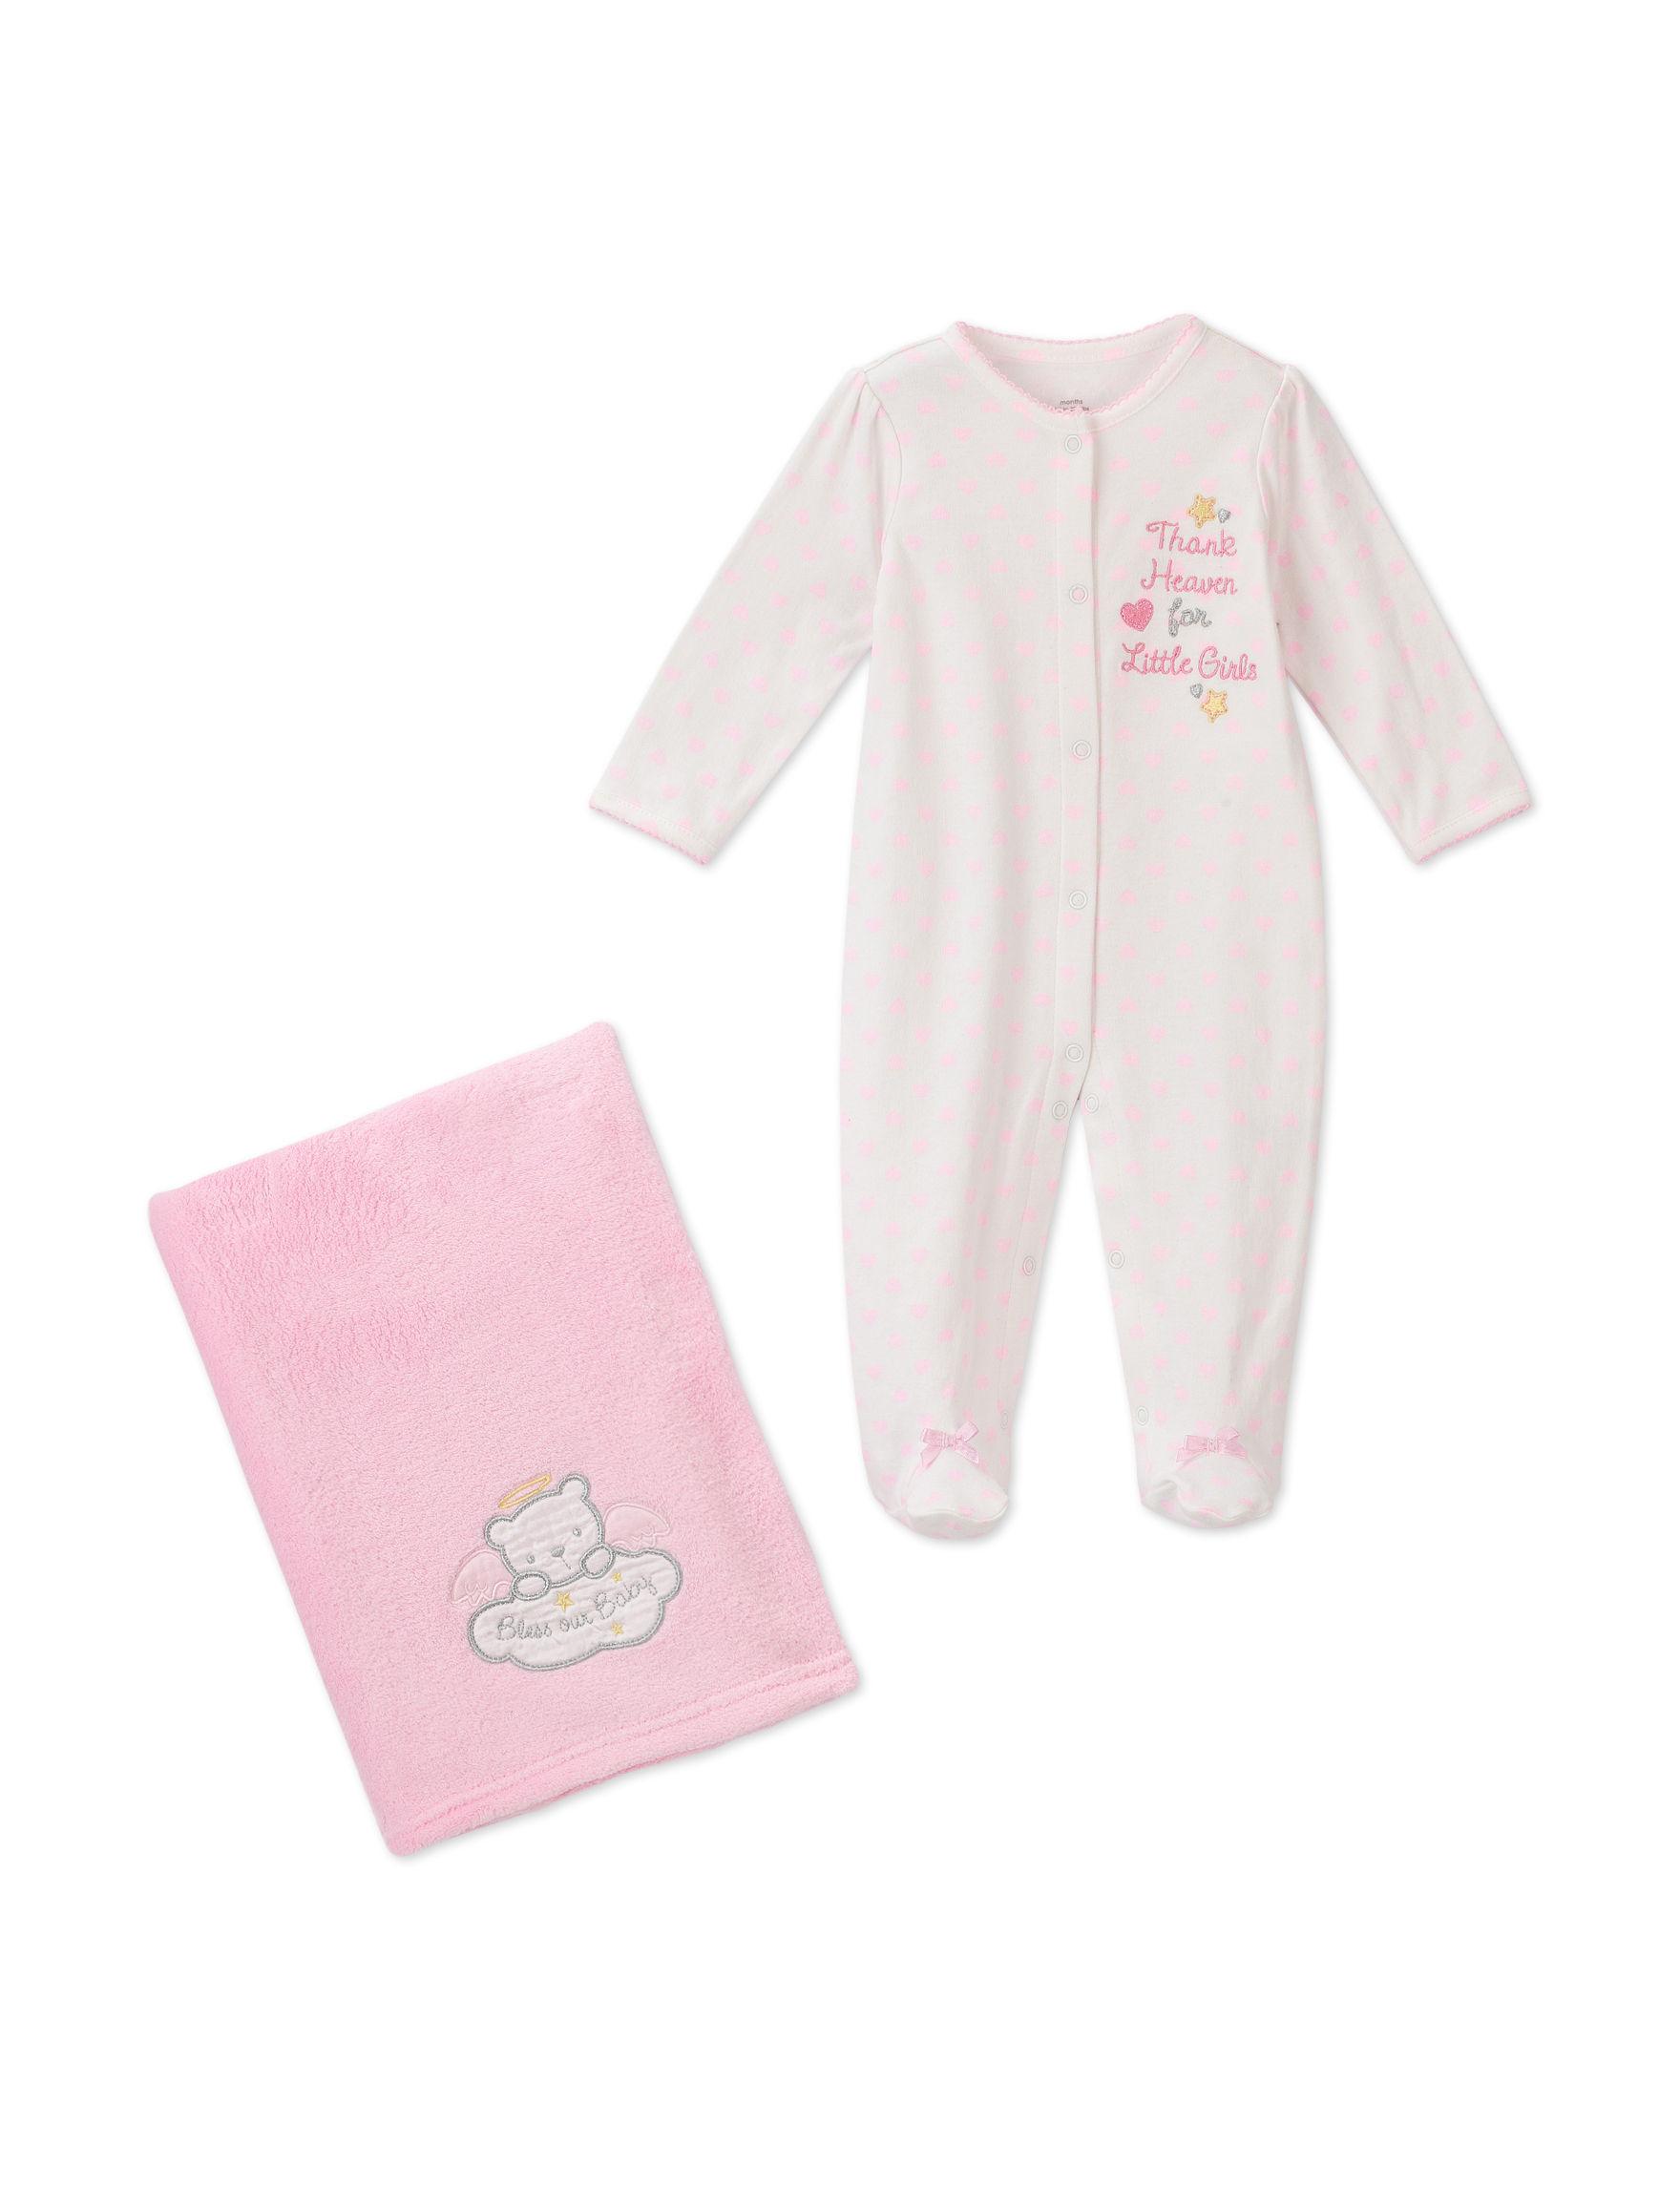 Baby Starters 2 pc Thank Heaven for Little Girls Sleep & Play